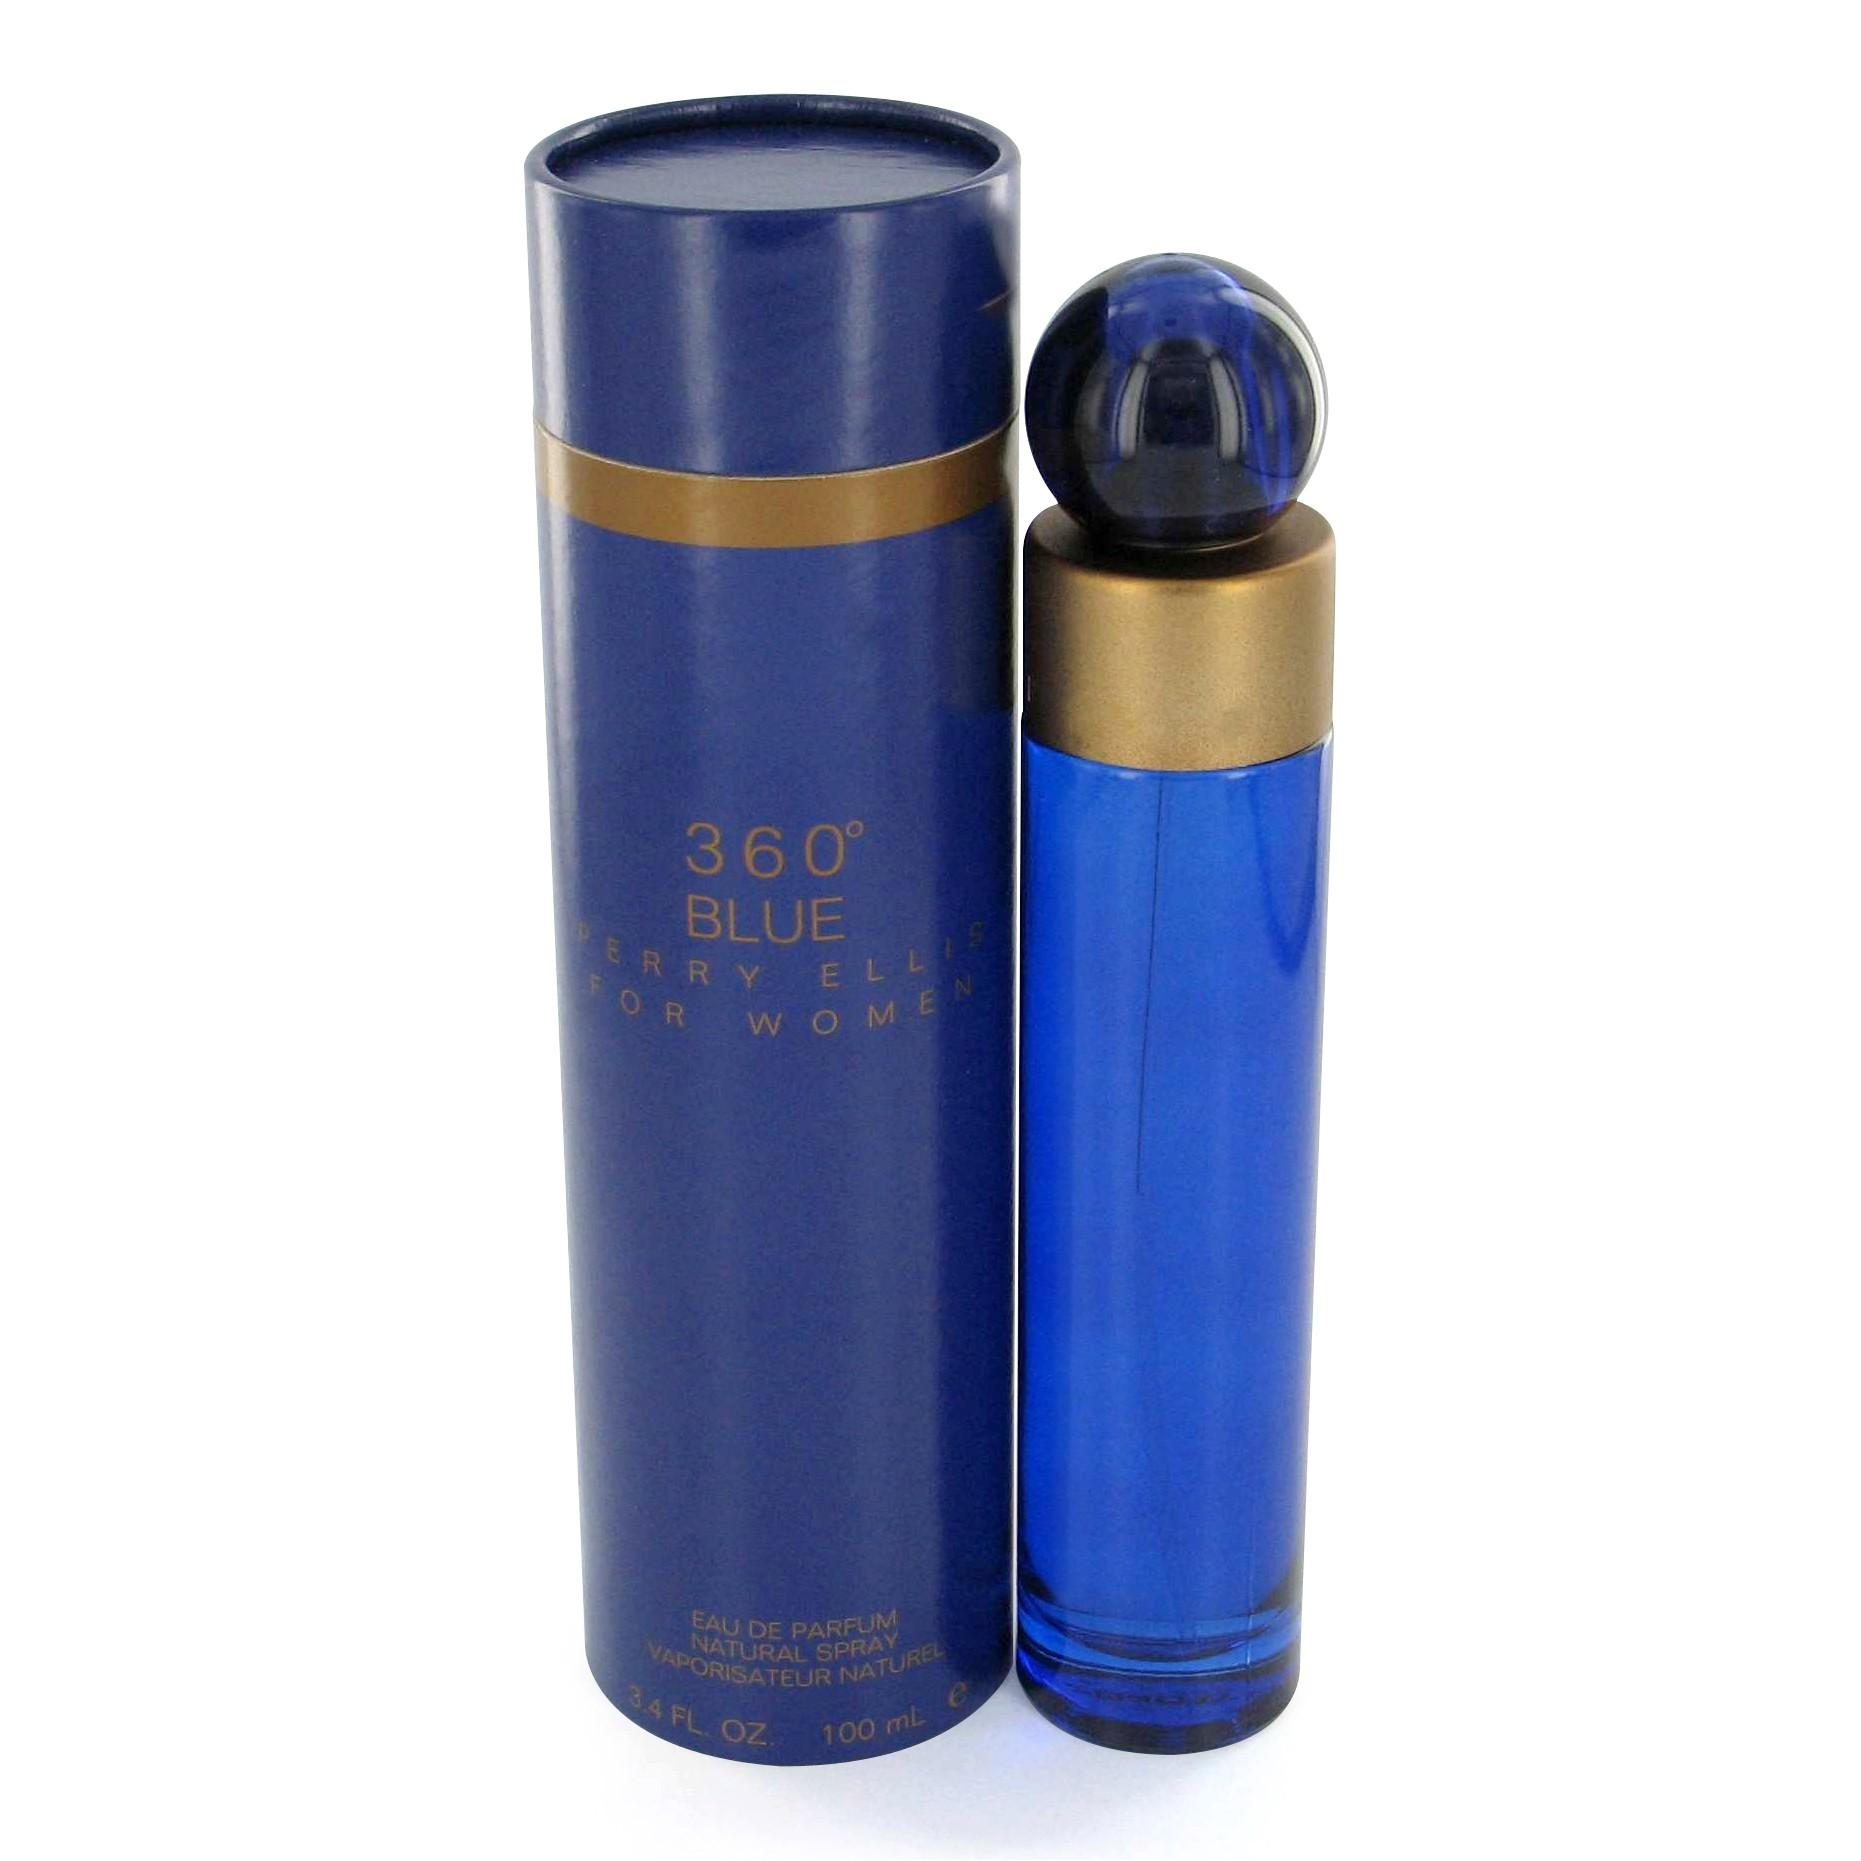 Perry Ellis 360° Blue for Women аромат для женщин